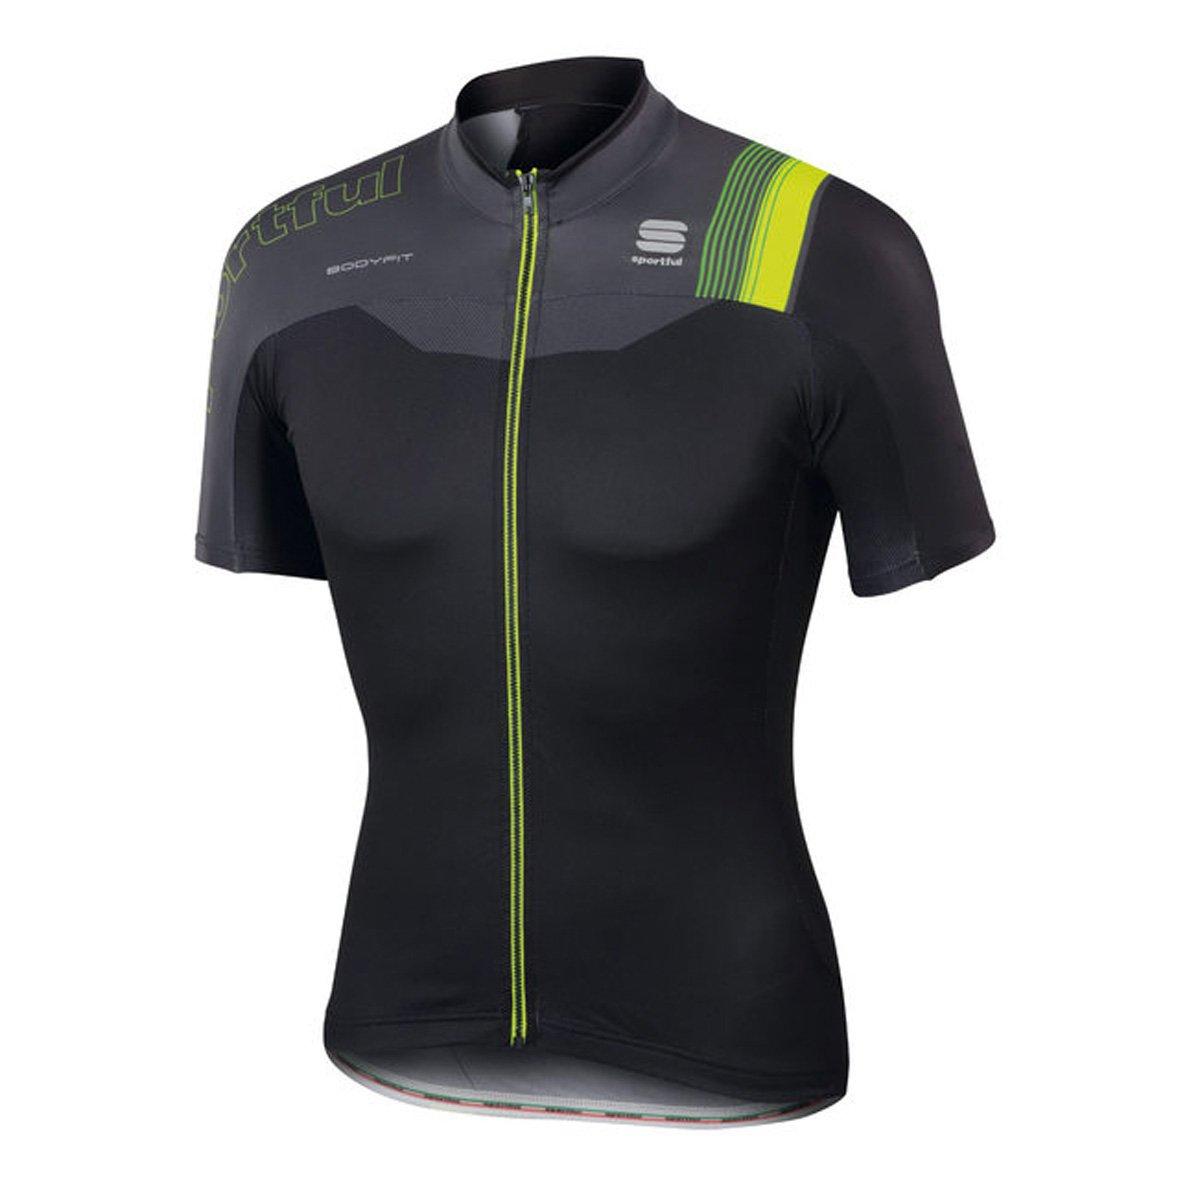 SportfulメンズBodyfit Pro Team半袖サイクリングジャージー – a1101727 Medium black/anthracite-yellow fluo B06XHWDK4Y